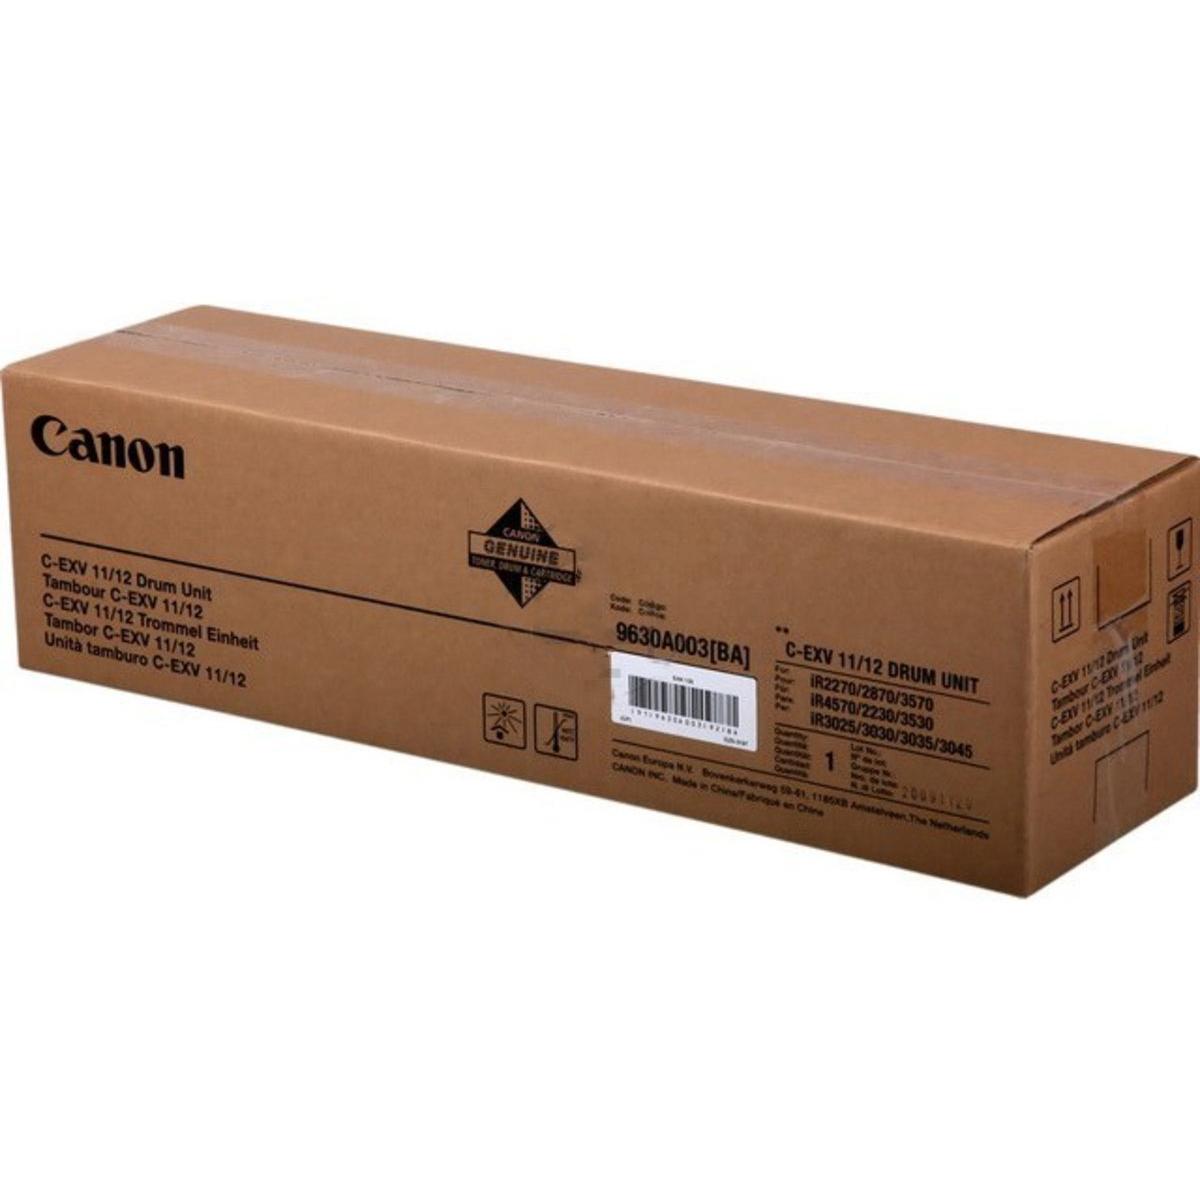 Canon ir 3530 printer